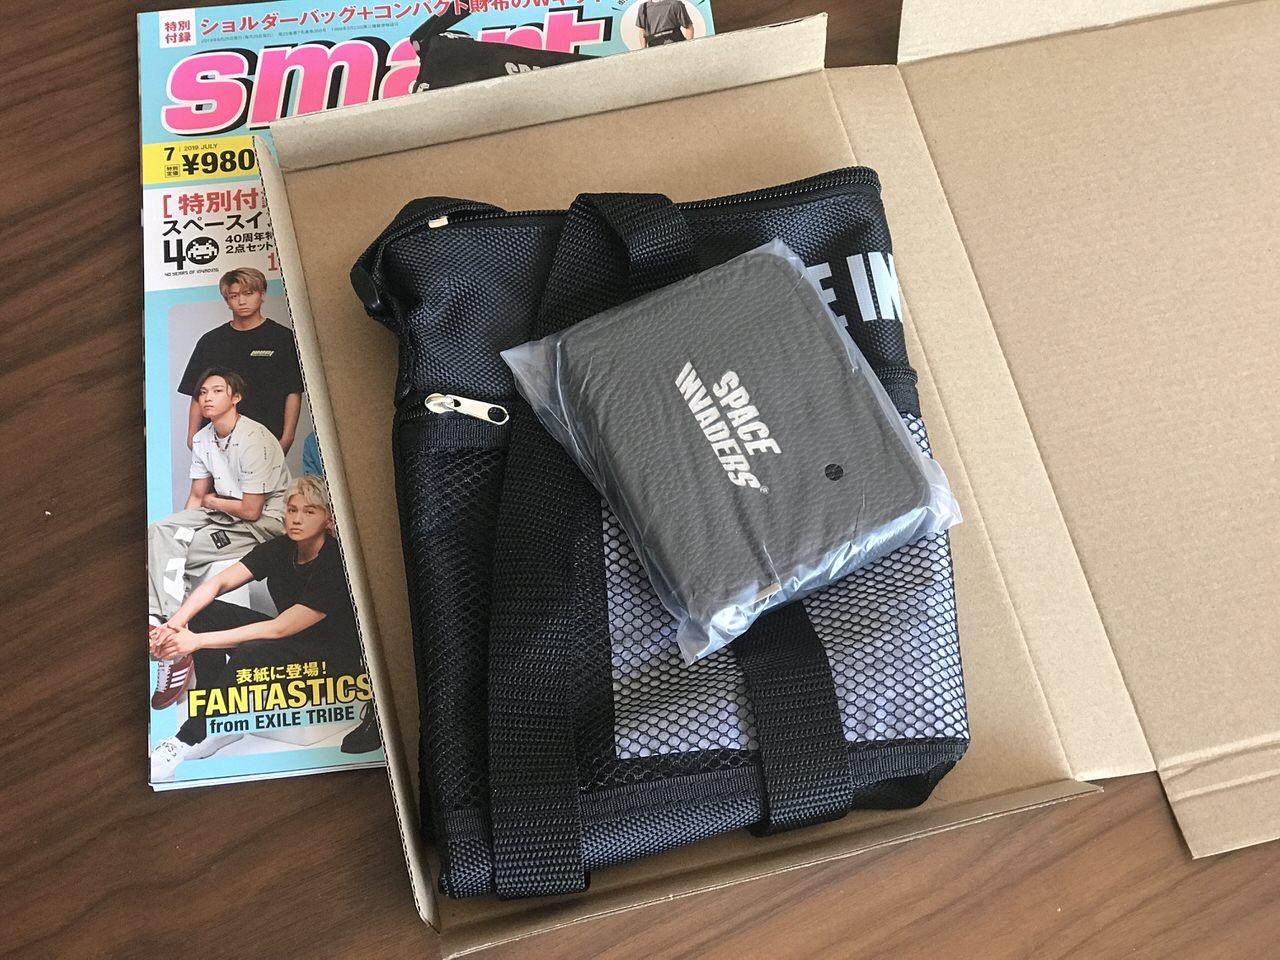 「smart」雑誌付録のインベーダーロゴ入りサコッシュと財布 3